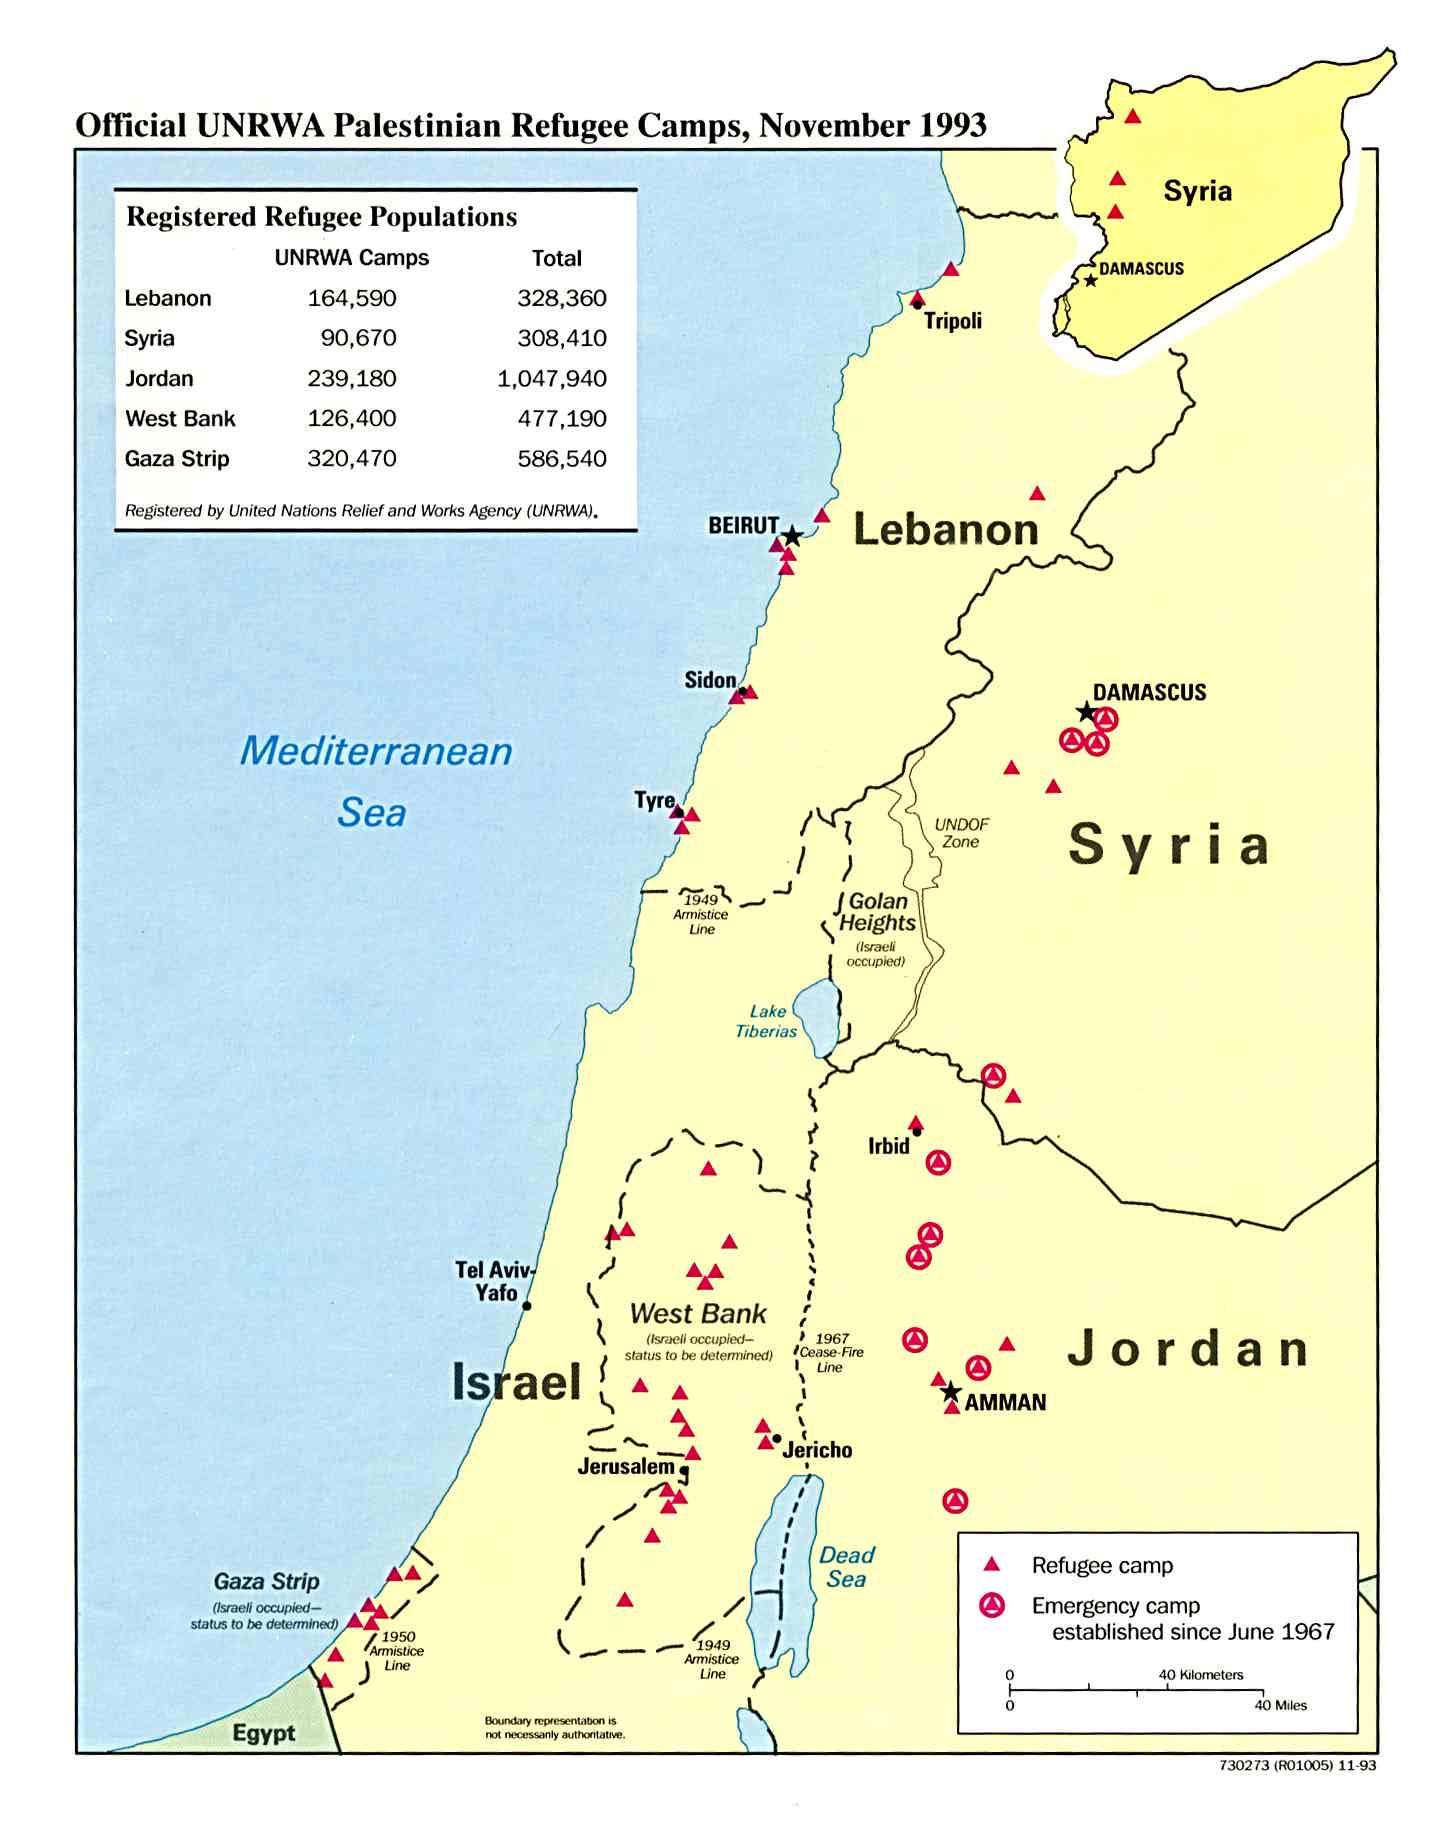 1Up Travel - Maps of West Bank and Gaza Strip. Palestinian Refugee Camps November 1993 (133K)